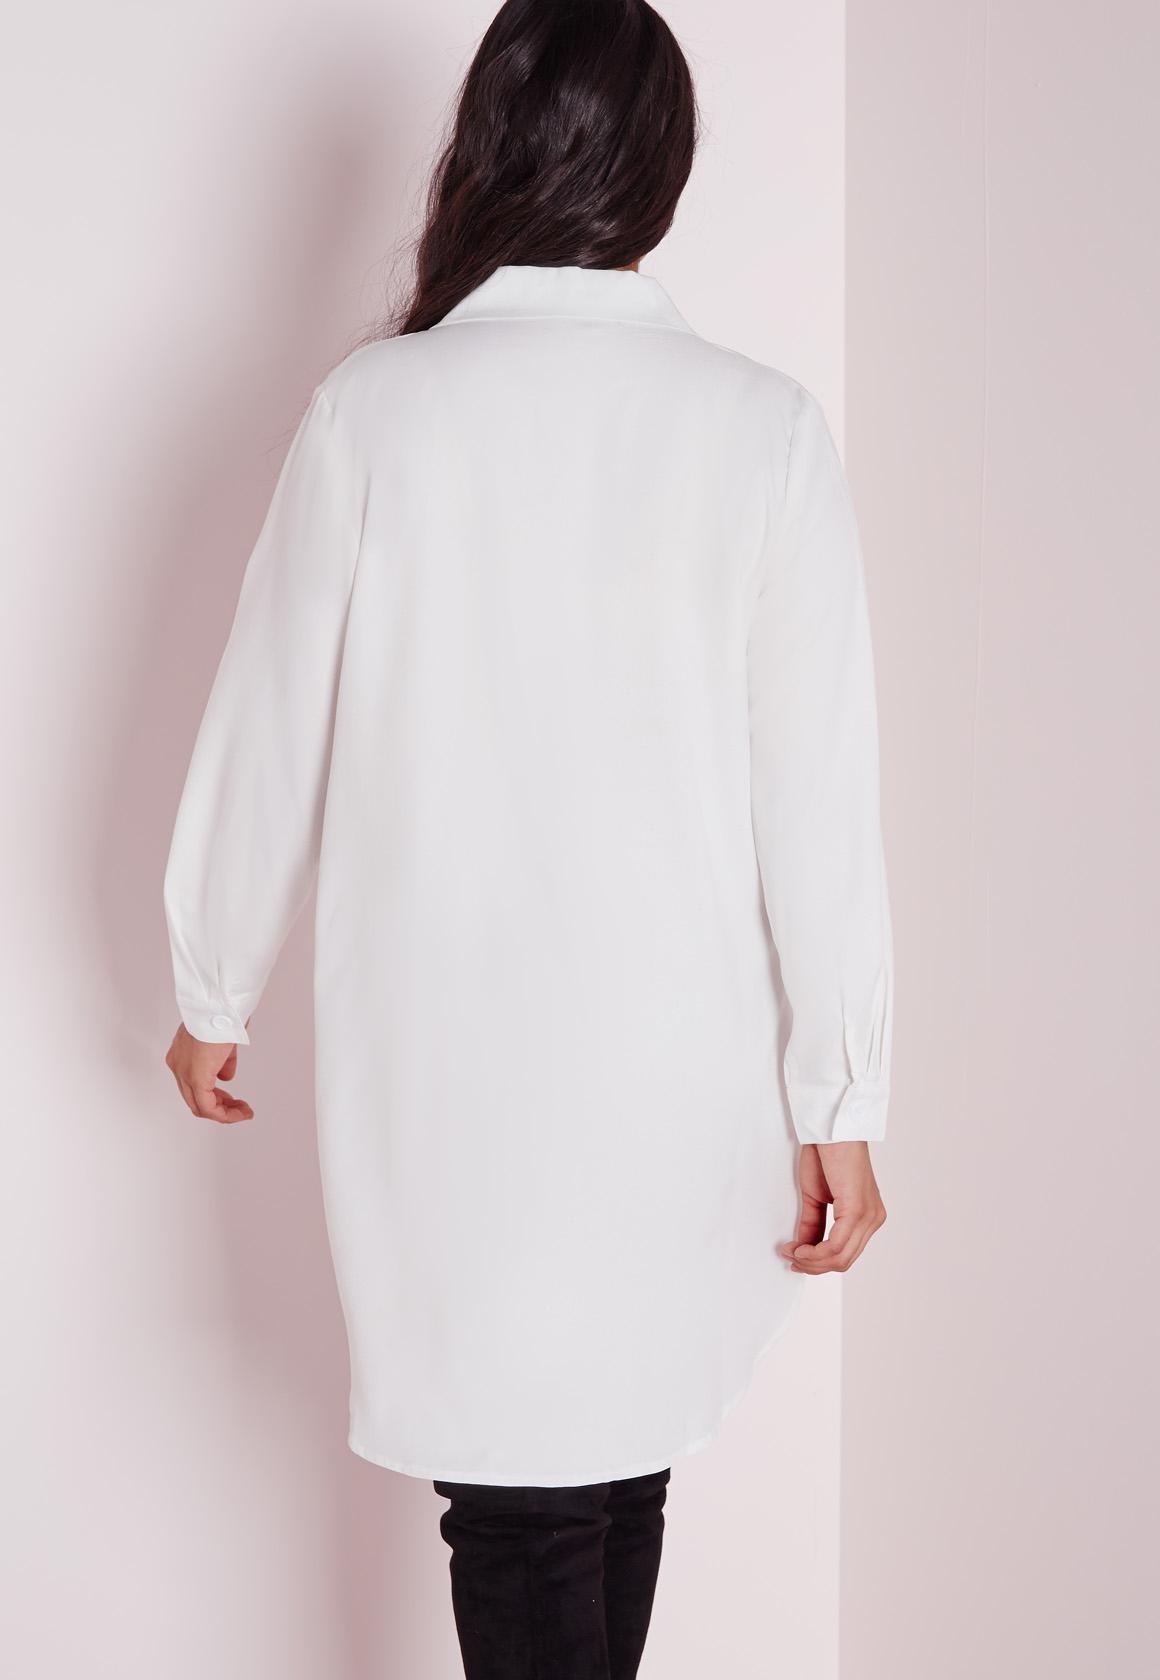 e8b884d9b7867 Lyst - Missguided Plus Size Tuxedo Shirt Dress White in White